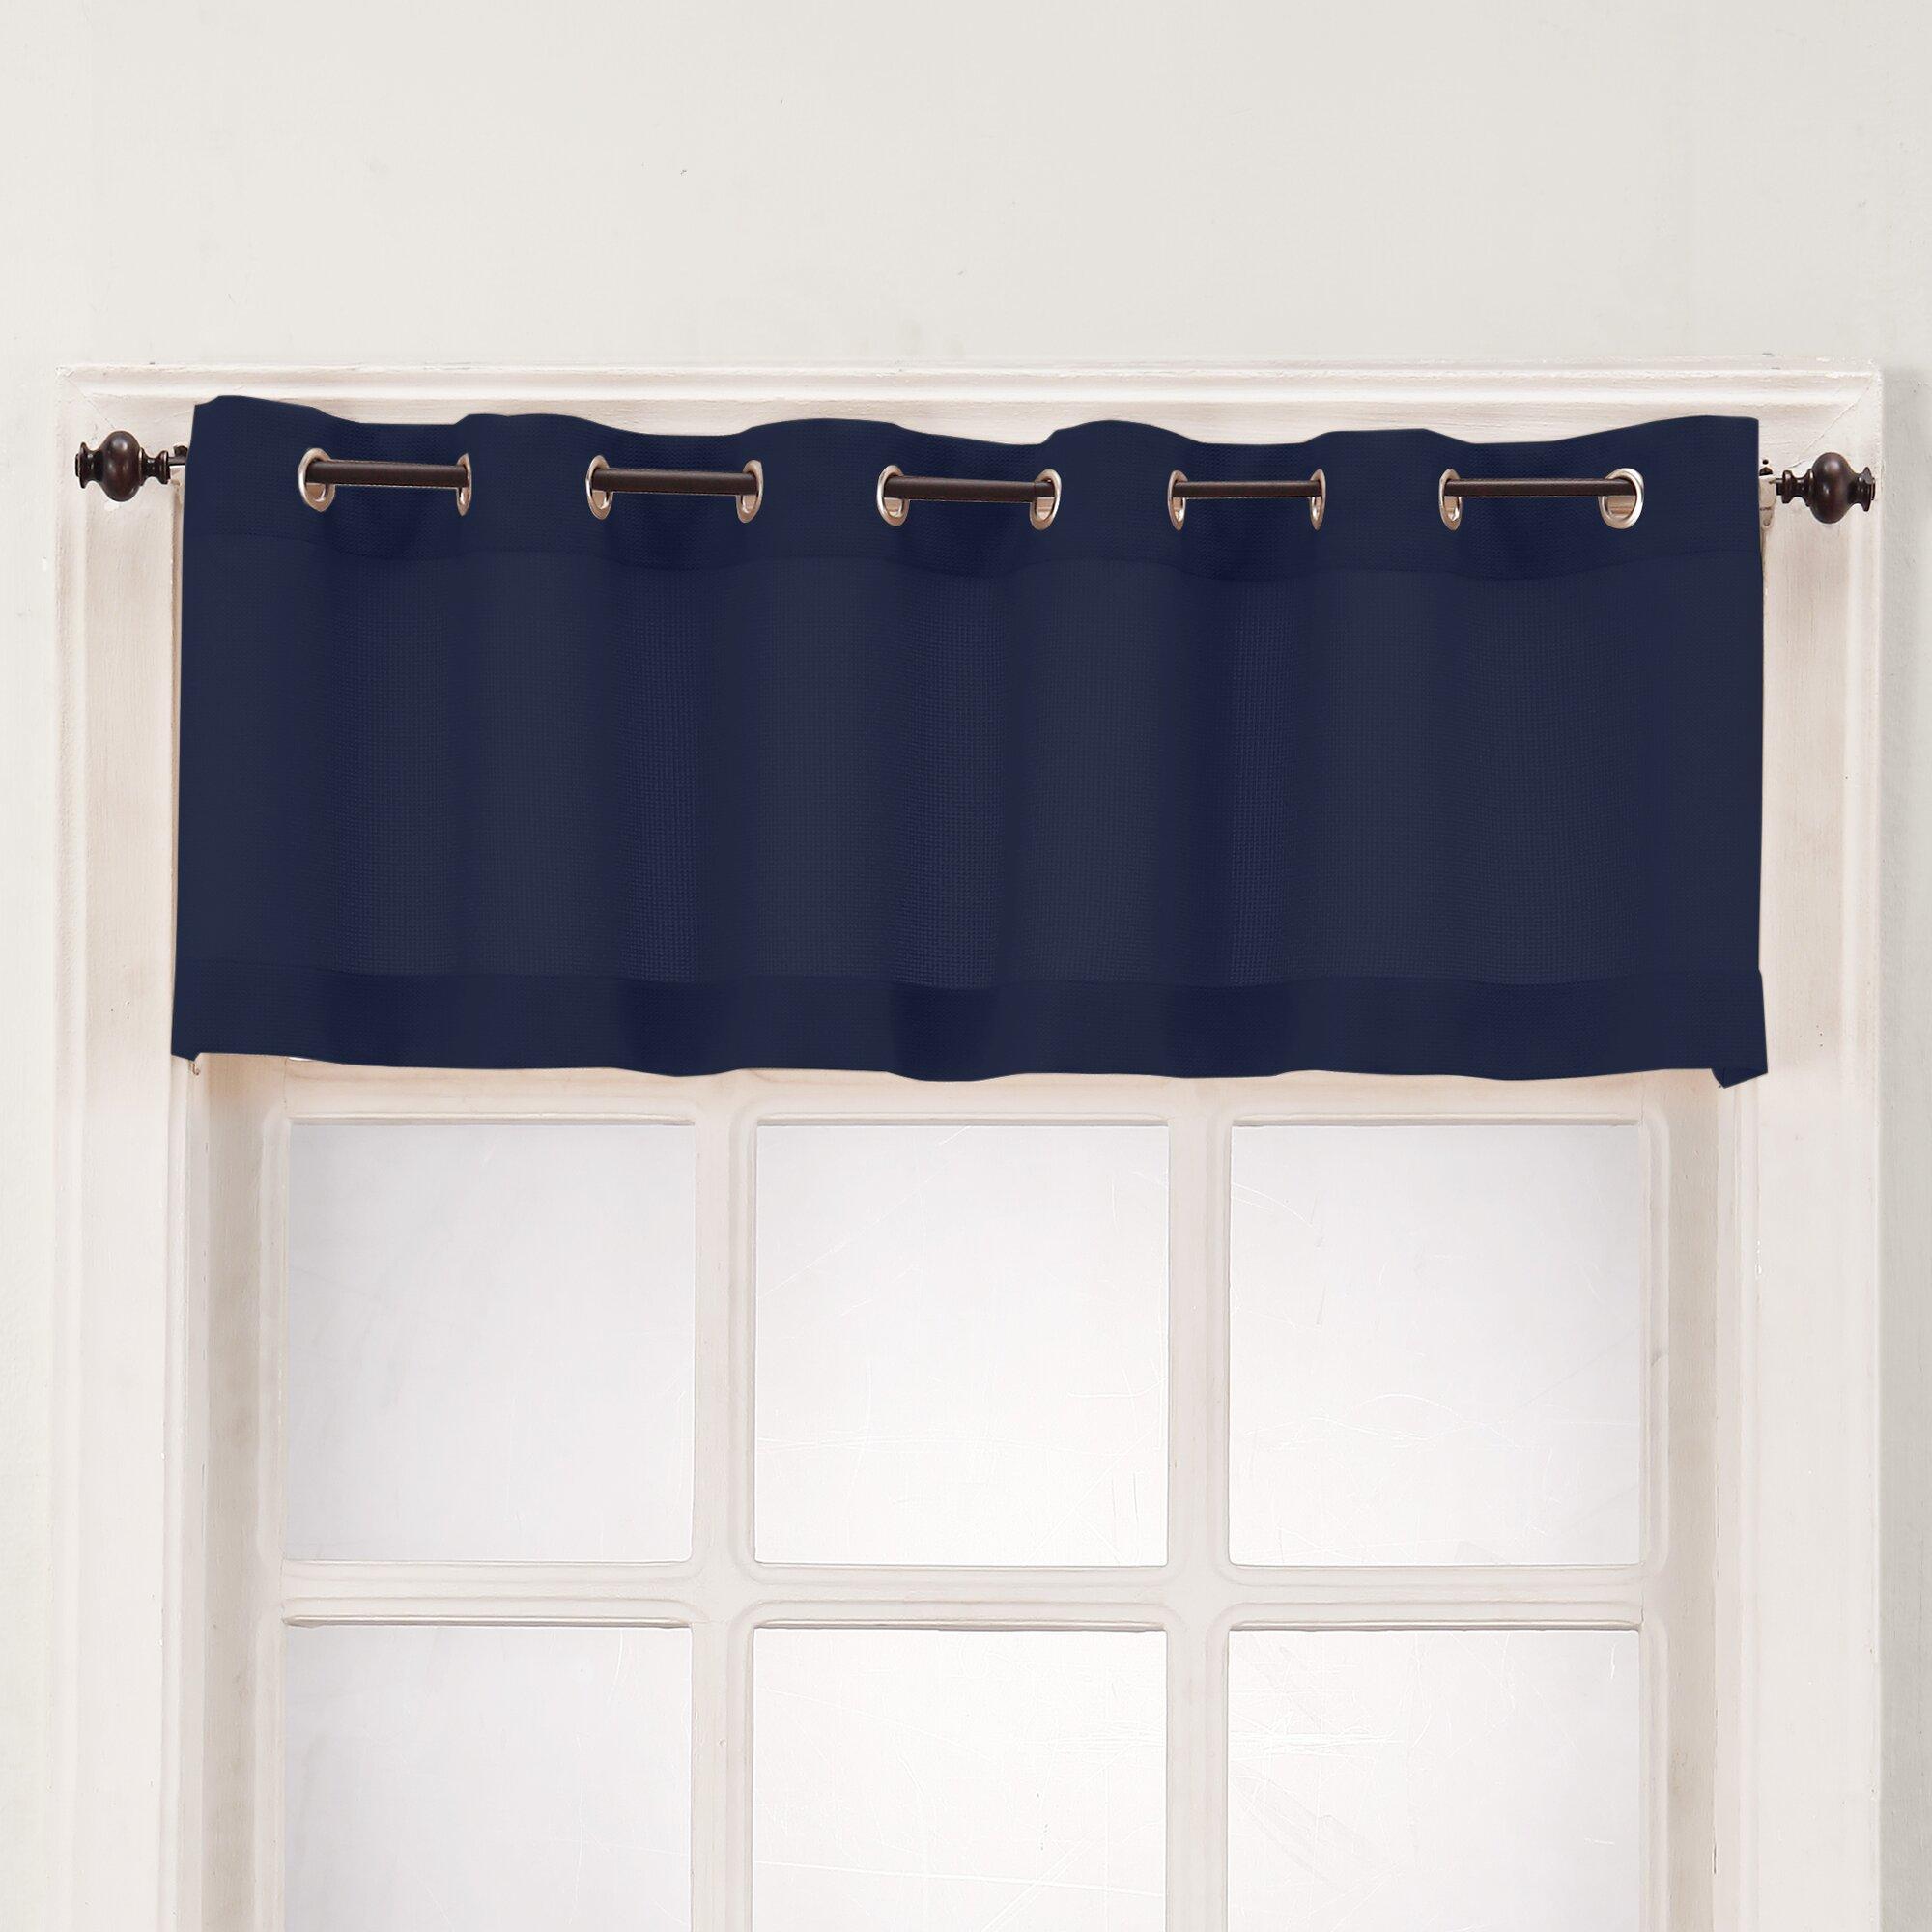 Kitchen Wood Valance: No. 918 Montego Casual Textured Kitchen Curtain Valance